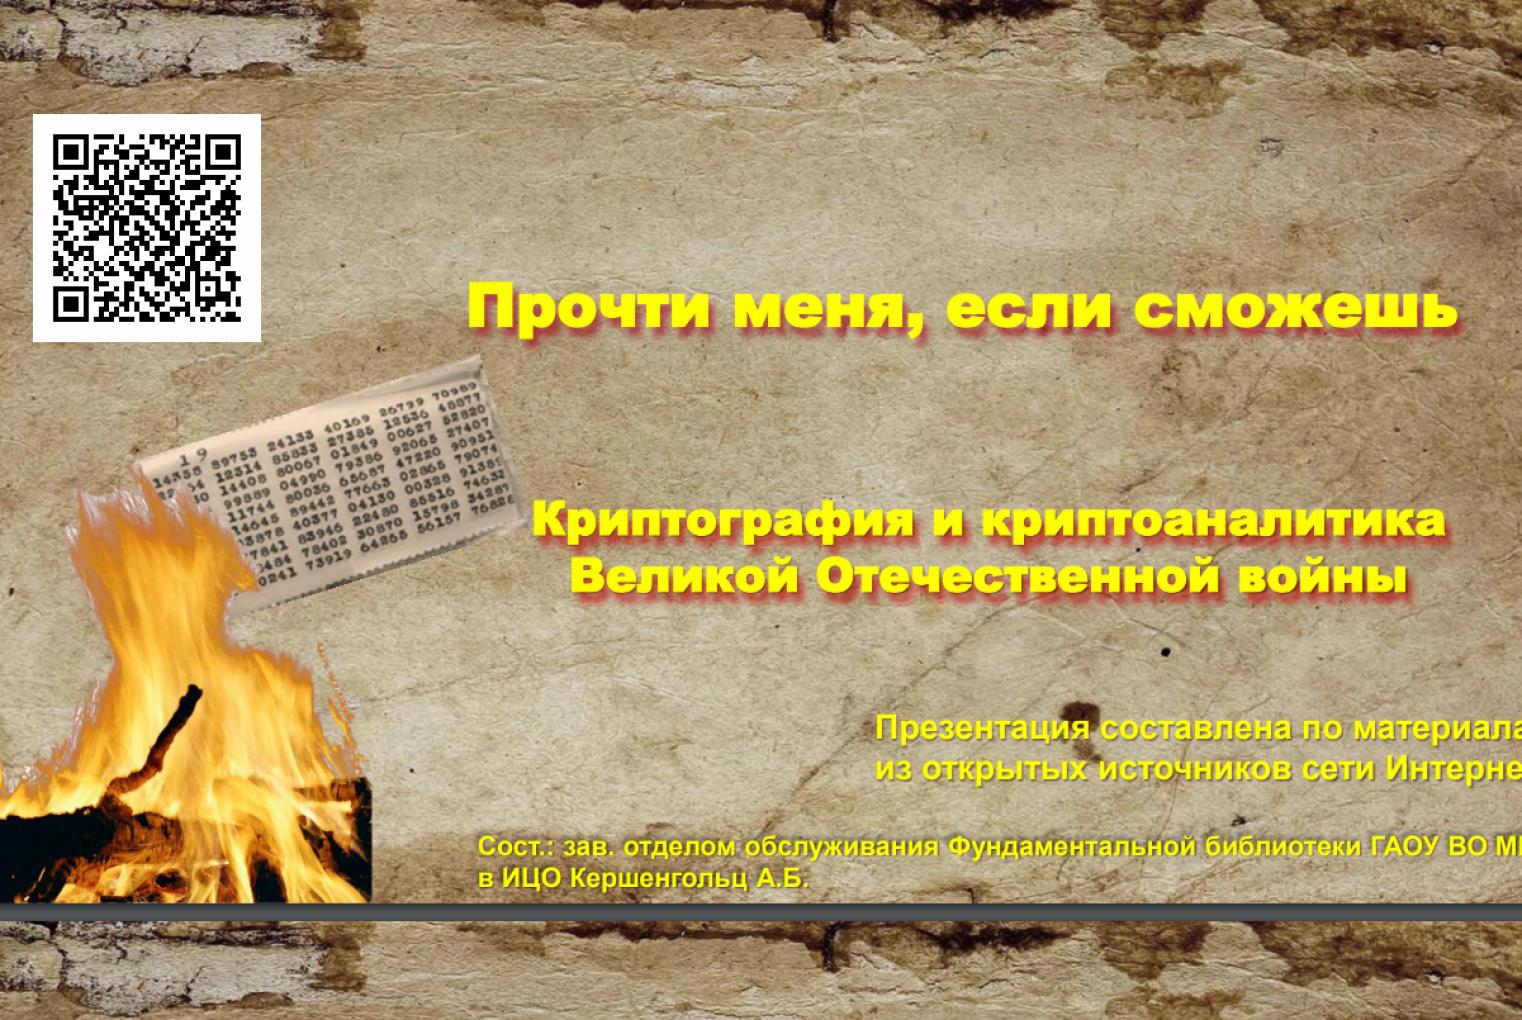 криптография и криптоаналитика ВОВ